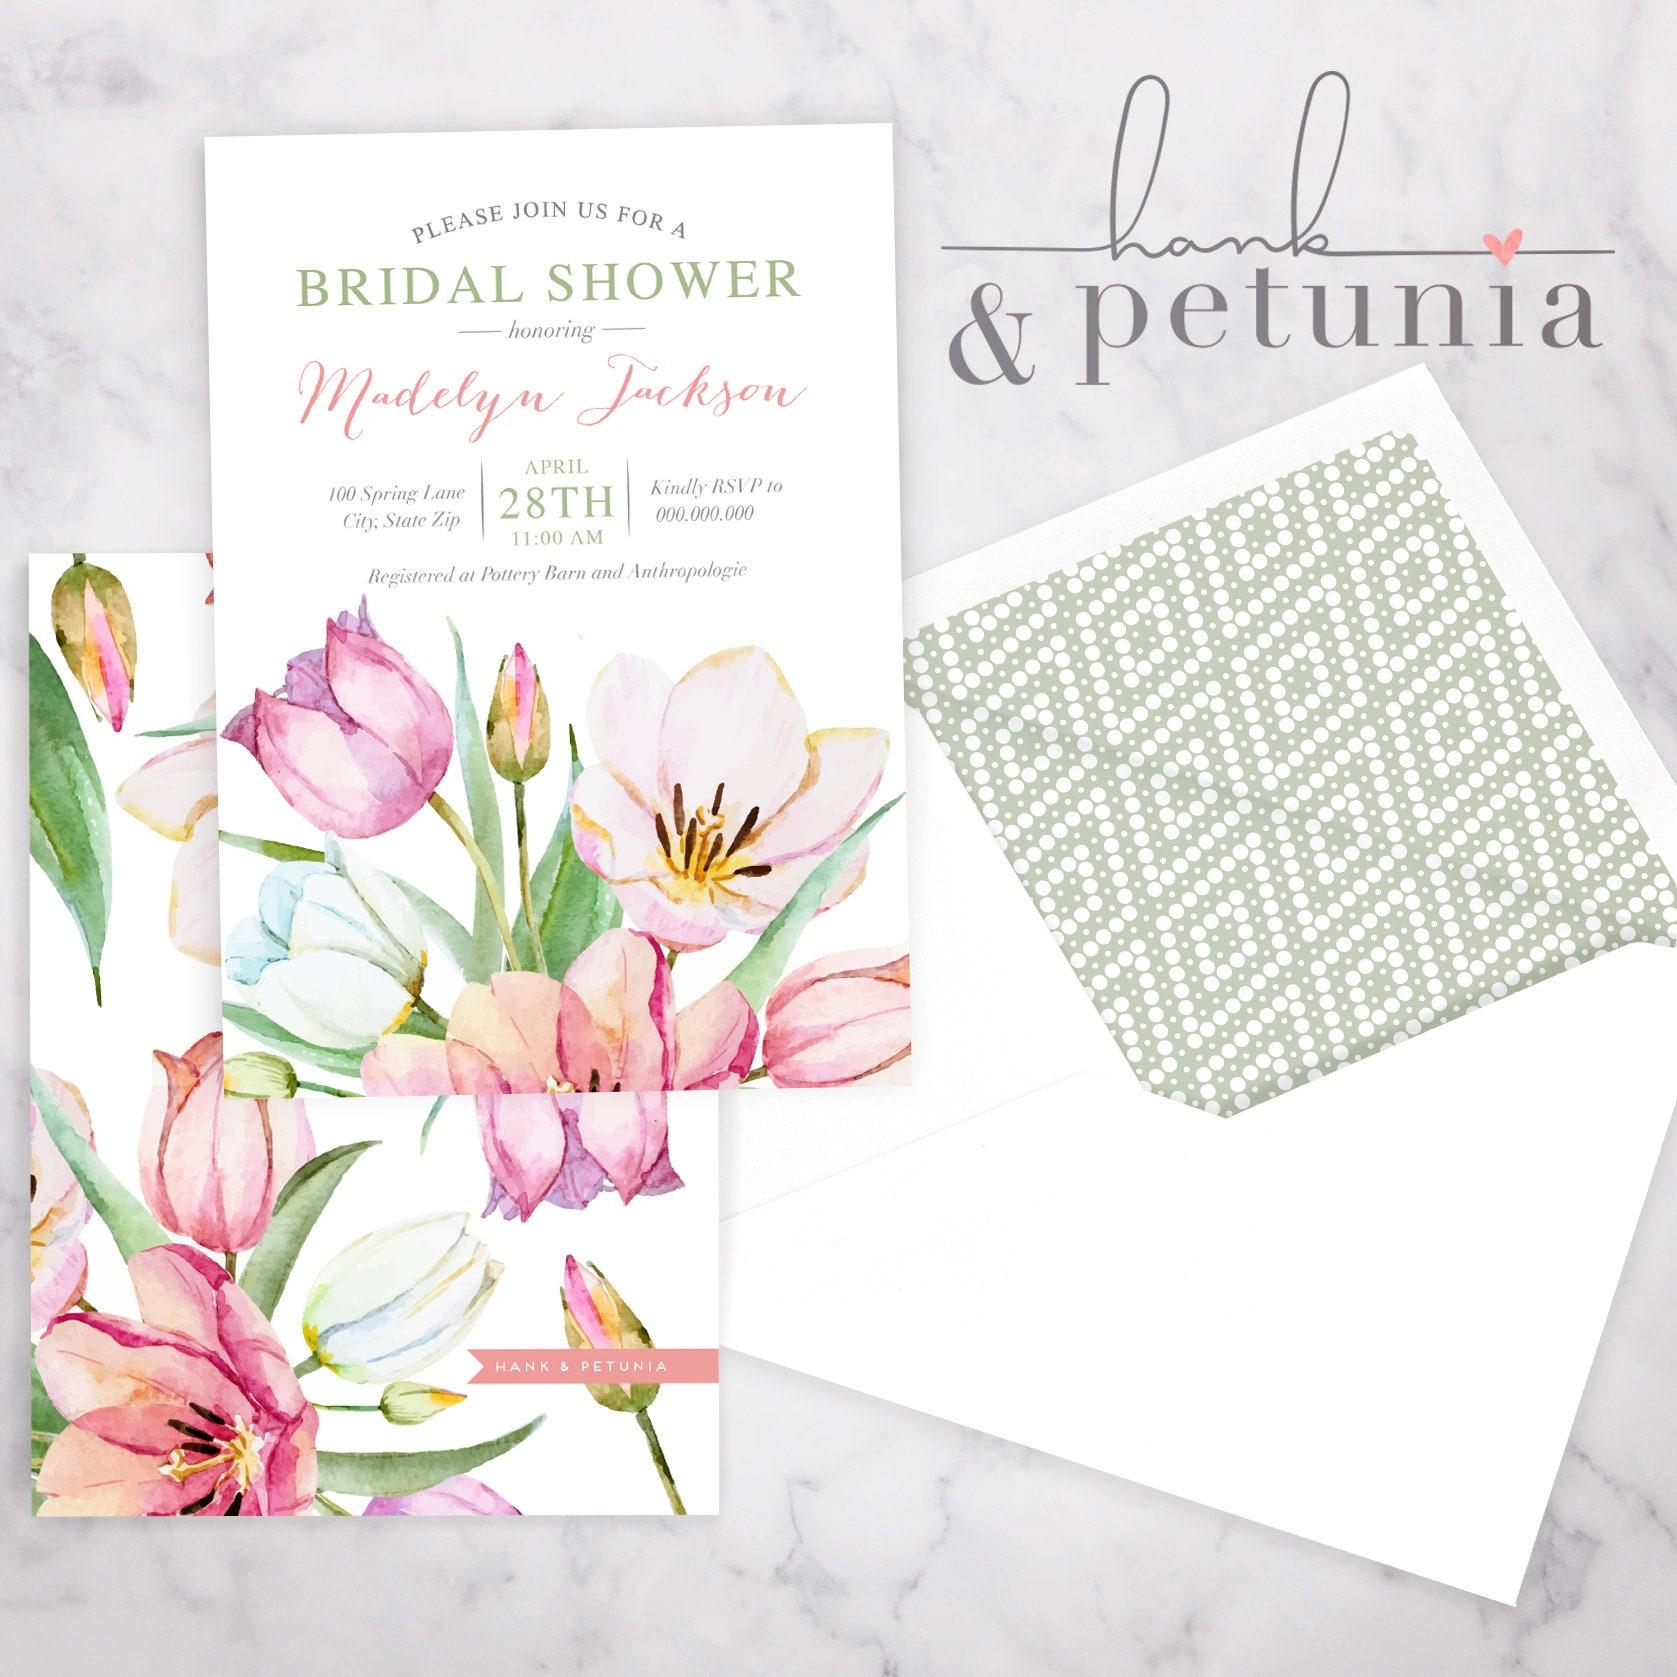 Spring tulips bridal shower invitation spring bridal shower invite spring tulips bridal shower invitation spring bridal shower invite bridal shower invite envelope liner filmwisefo